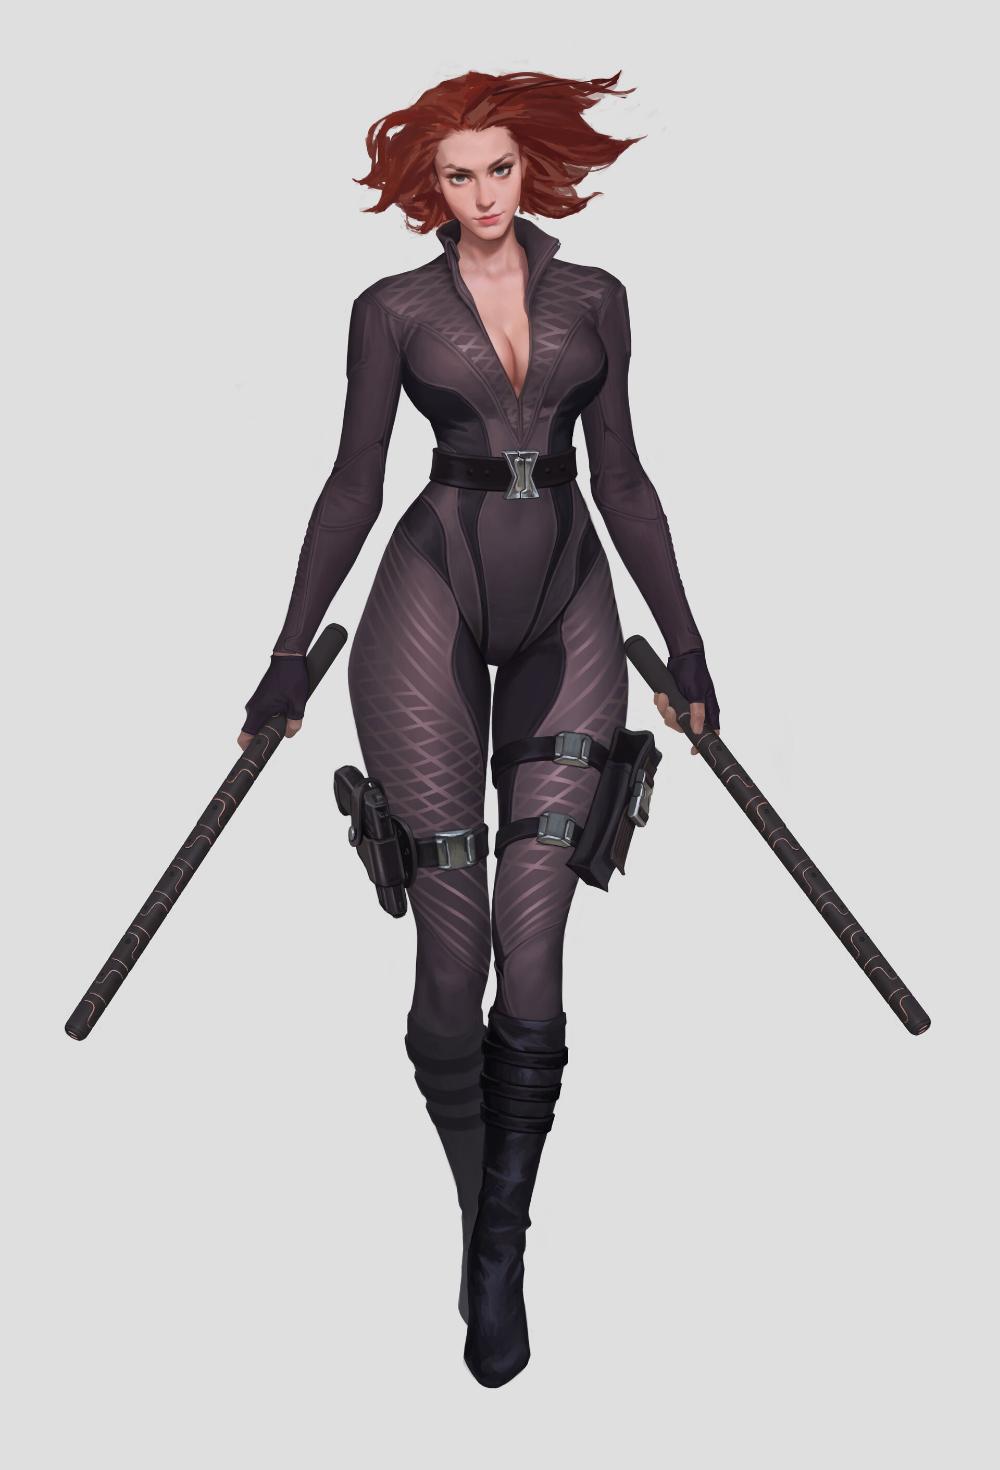 Artstation Black Widow Zheng Huang Black Widow Marvel Marvel Girls Black Widow